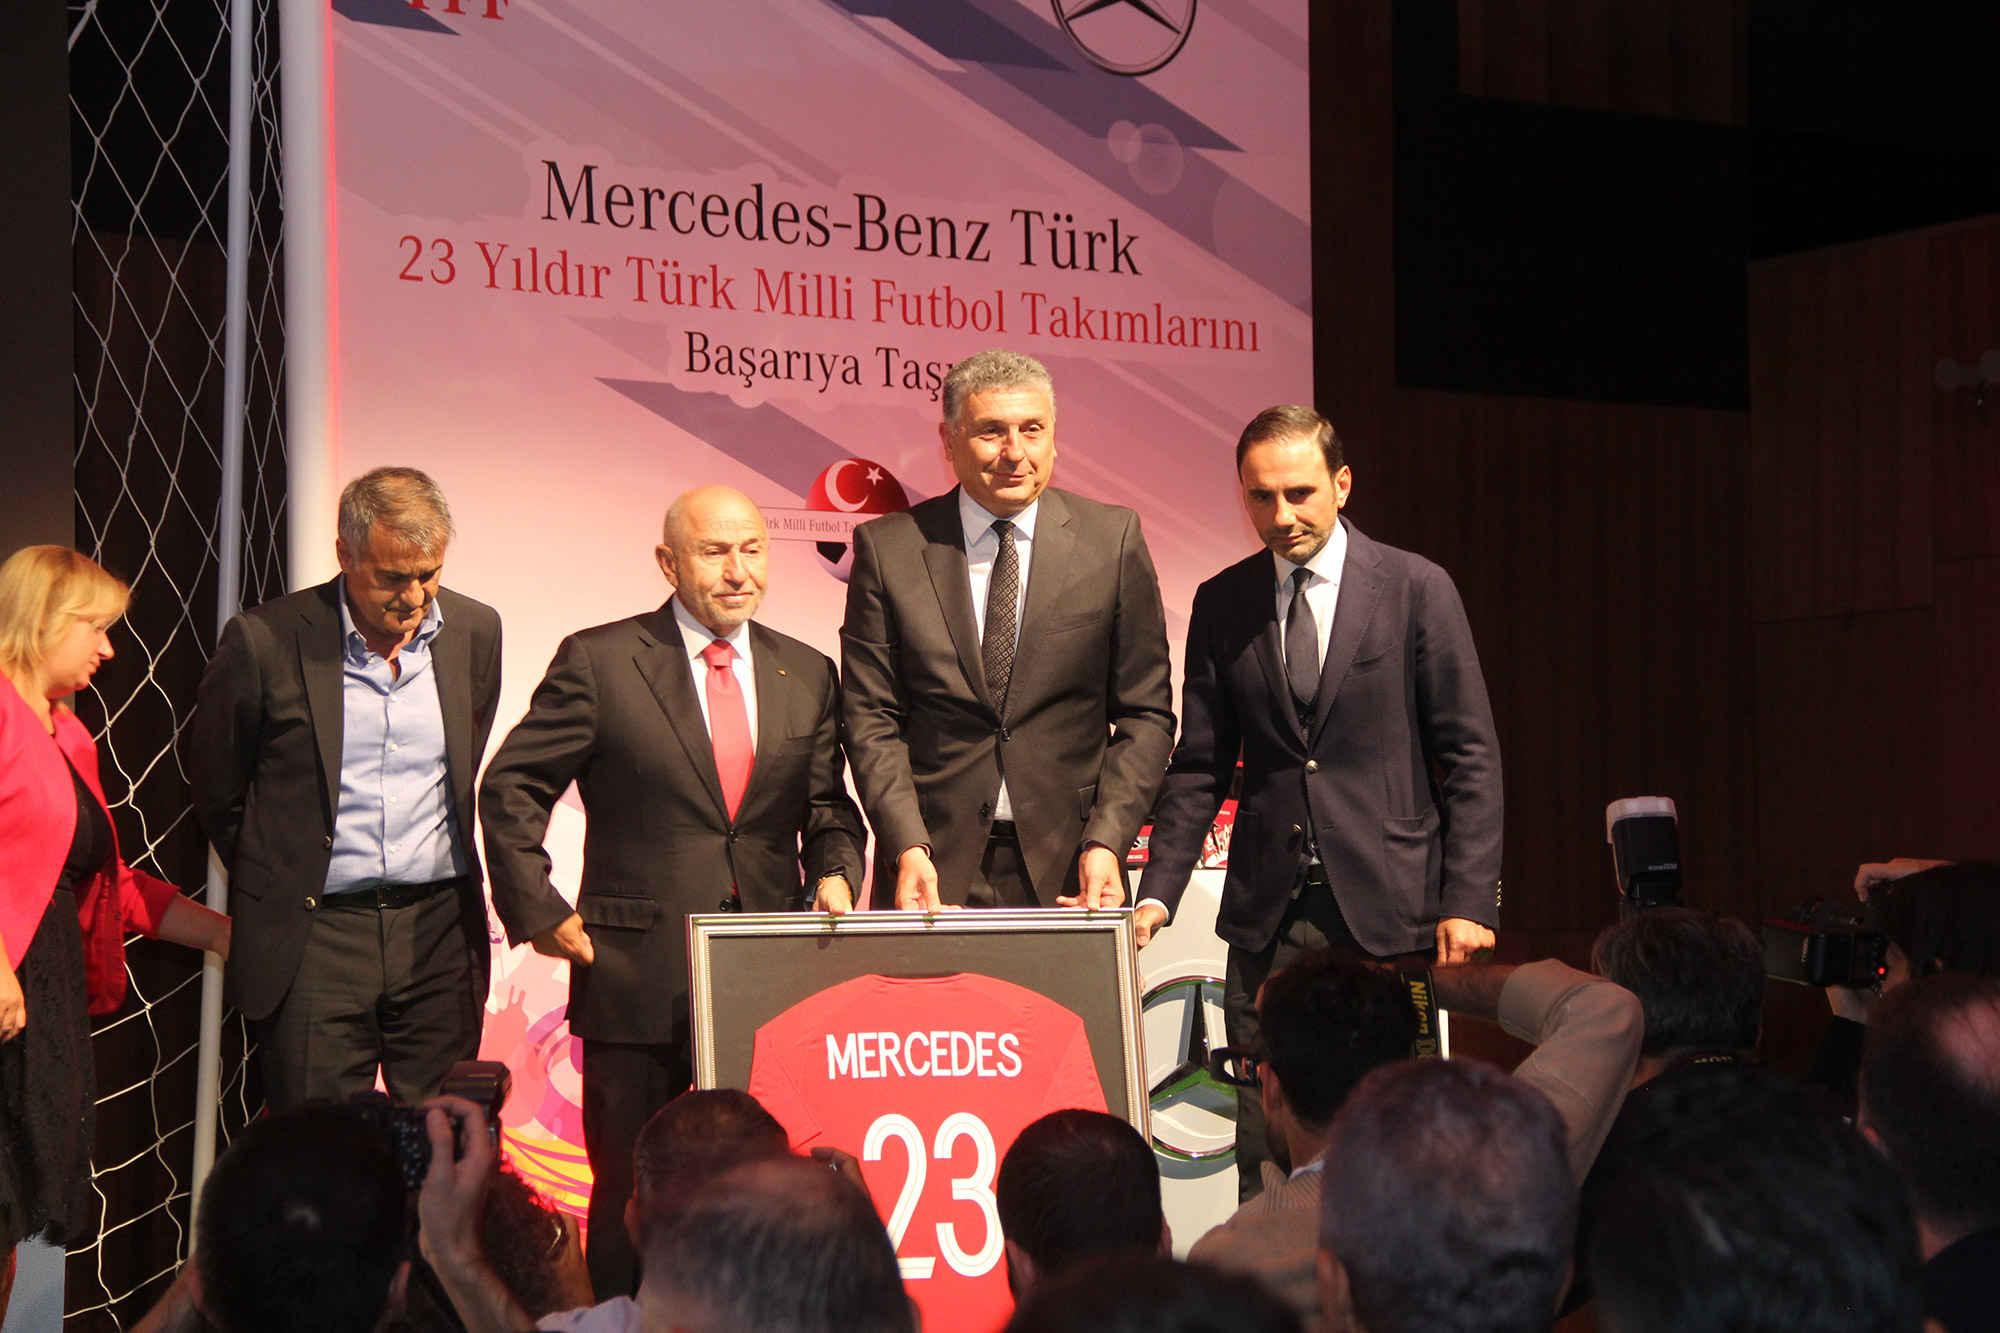 mercedes-benz-turk-tff-sponsor-imza-toreni.jpg